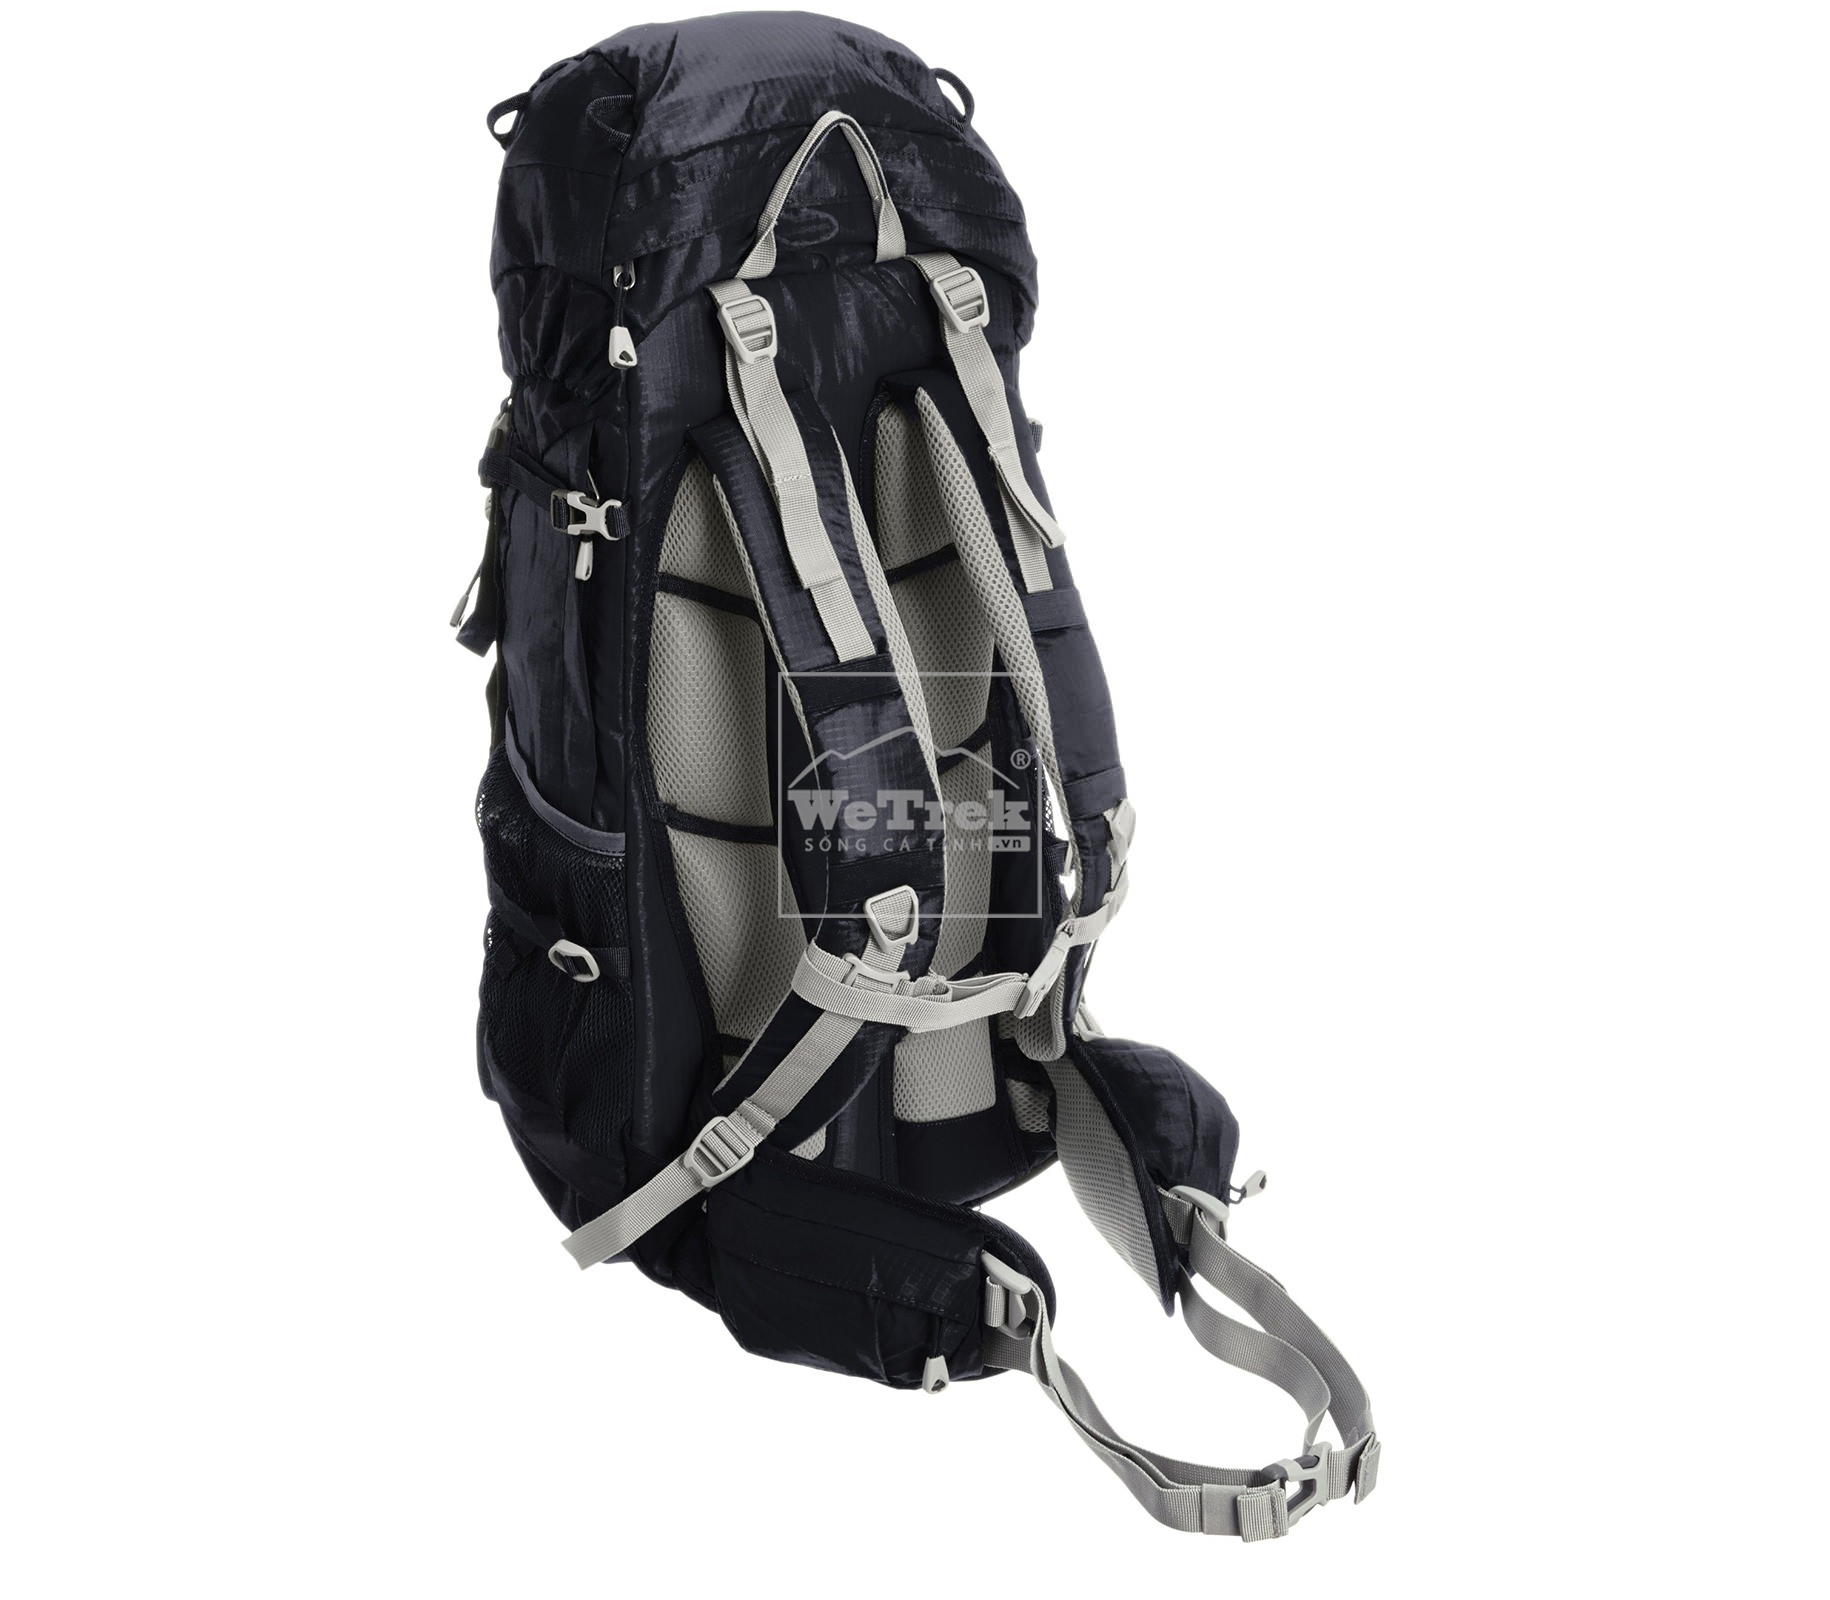 ba-lo-leo-nui-30l-coleman-mttrek-lite-backpack-black-cbb4071bk-7457-wetrek.vn-1